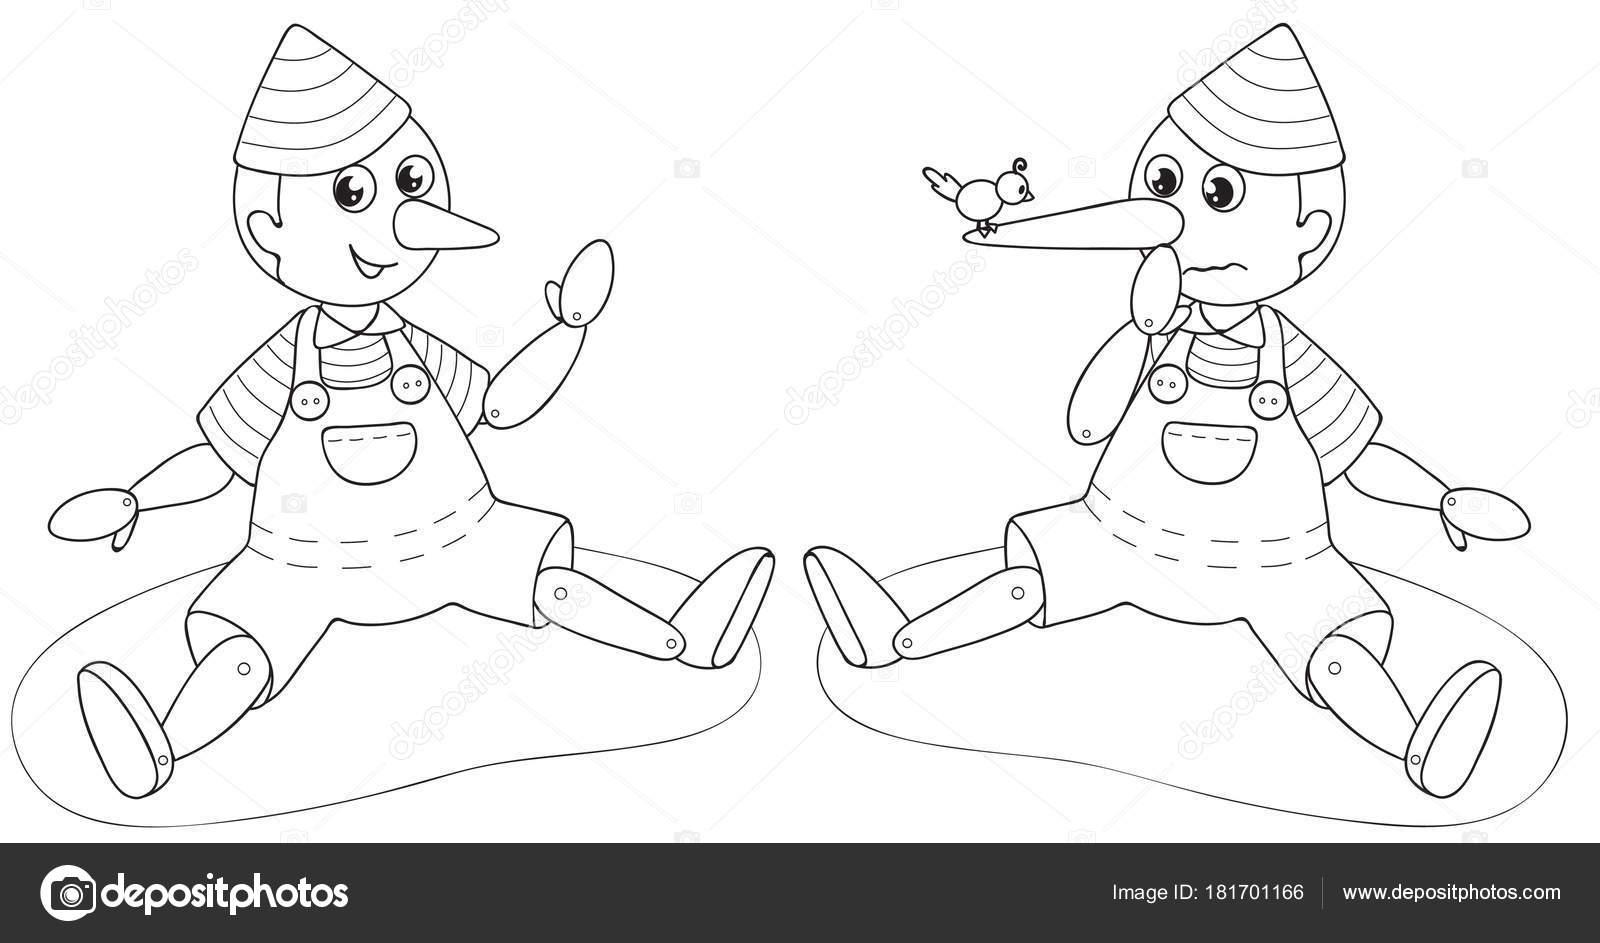 Pinokyo Yalancı Kukla Boyama Vektör Stok Vektör Carlacastagno